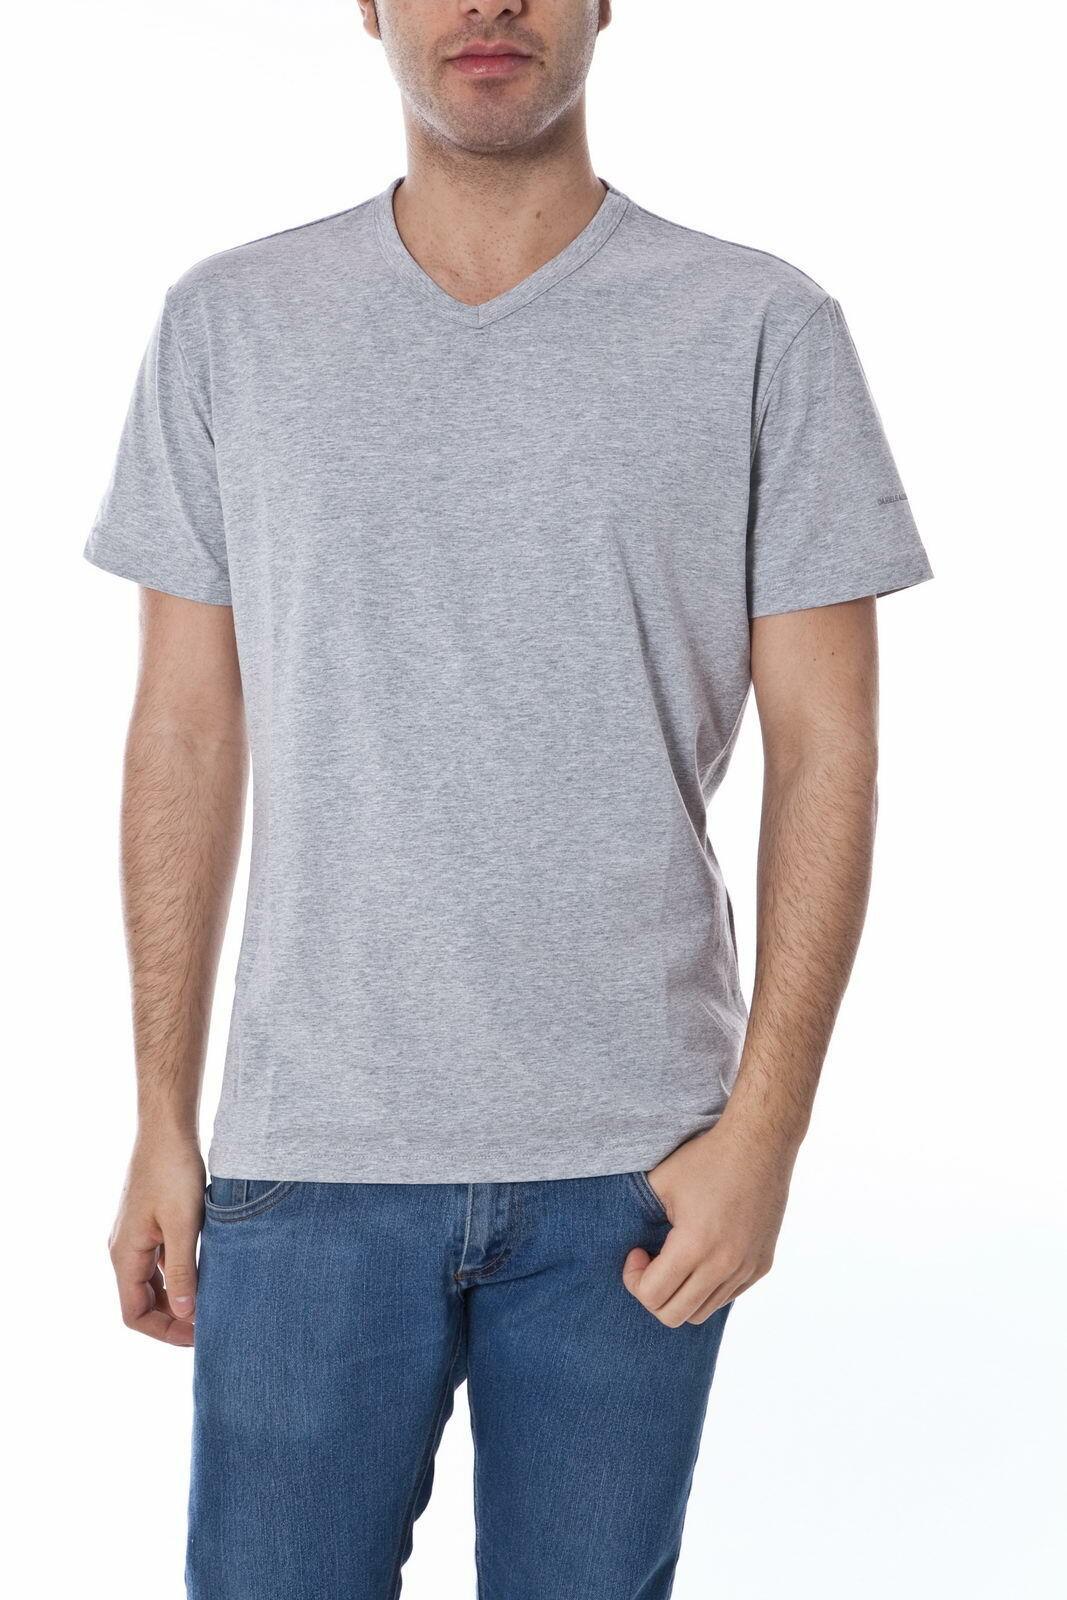 Daniele Alessandrini T Shirt Sweatshirt Man grau M4399E4603300 7 Sz.52 PUT OFFER